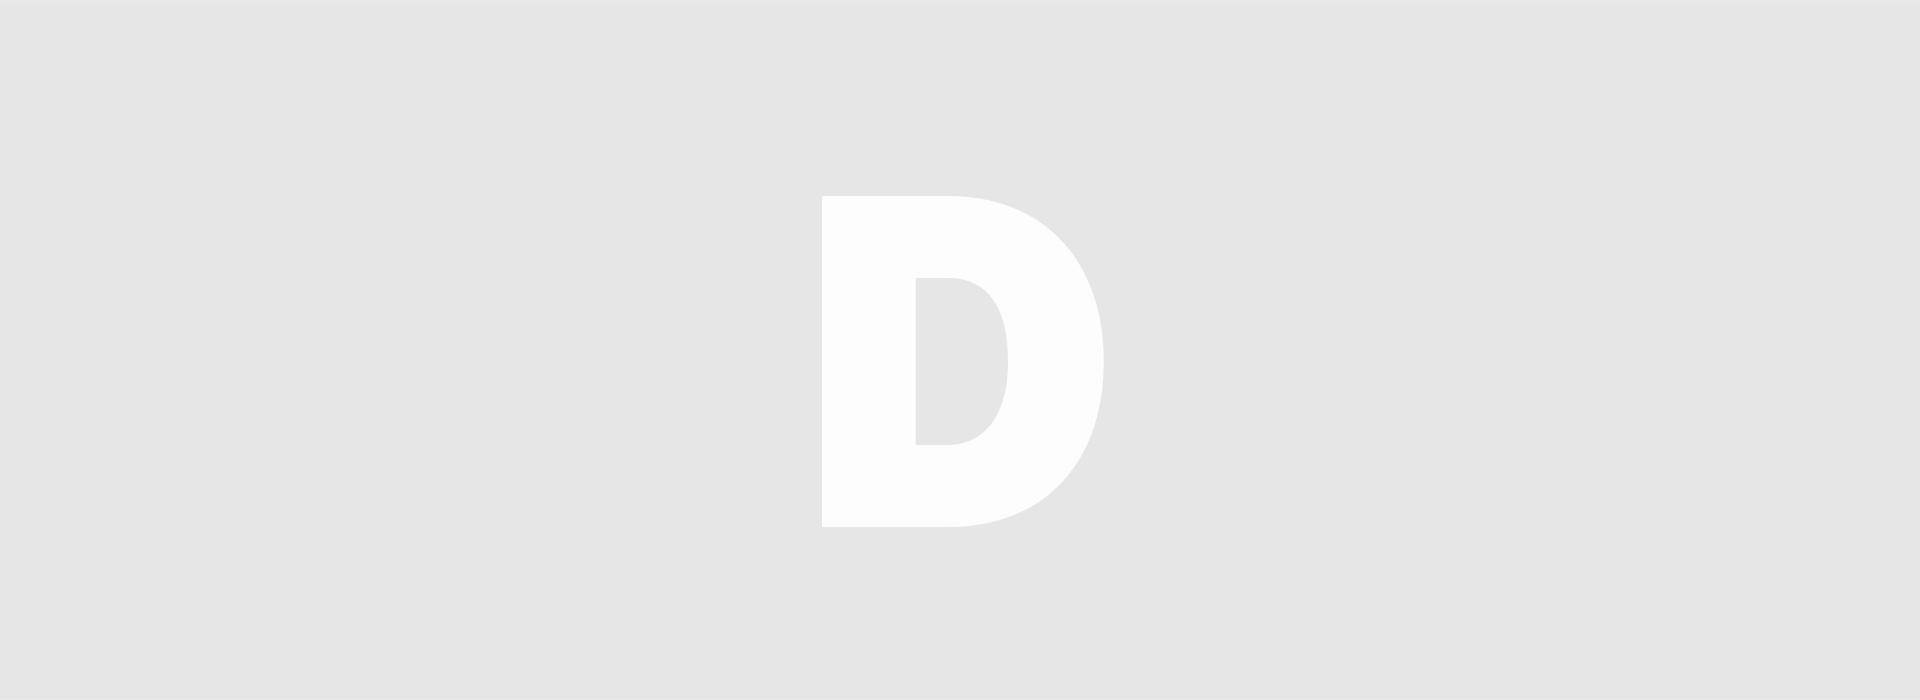 denzoo-header-01.jpg